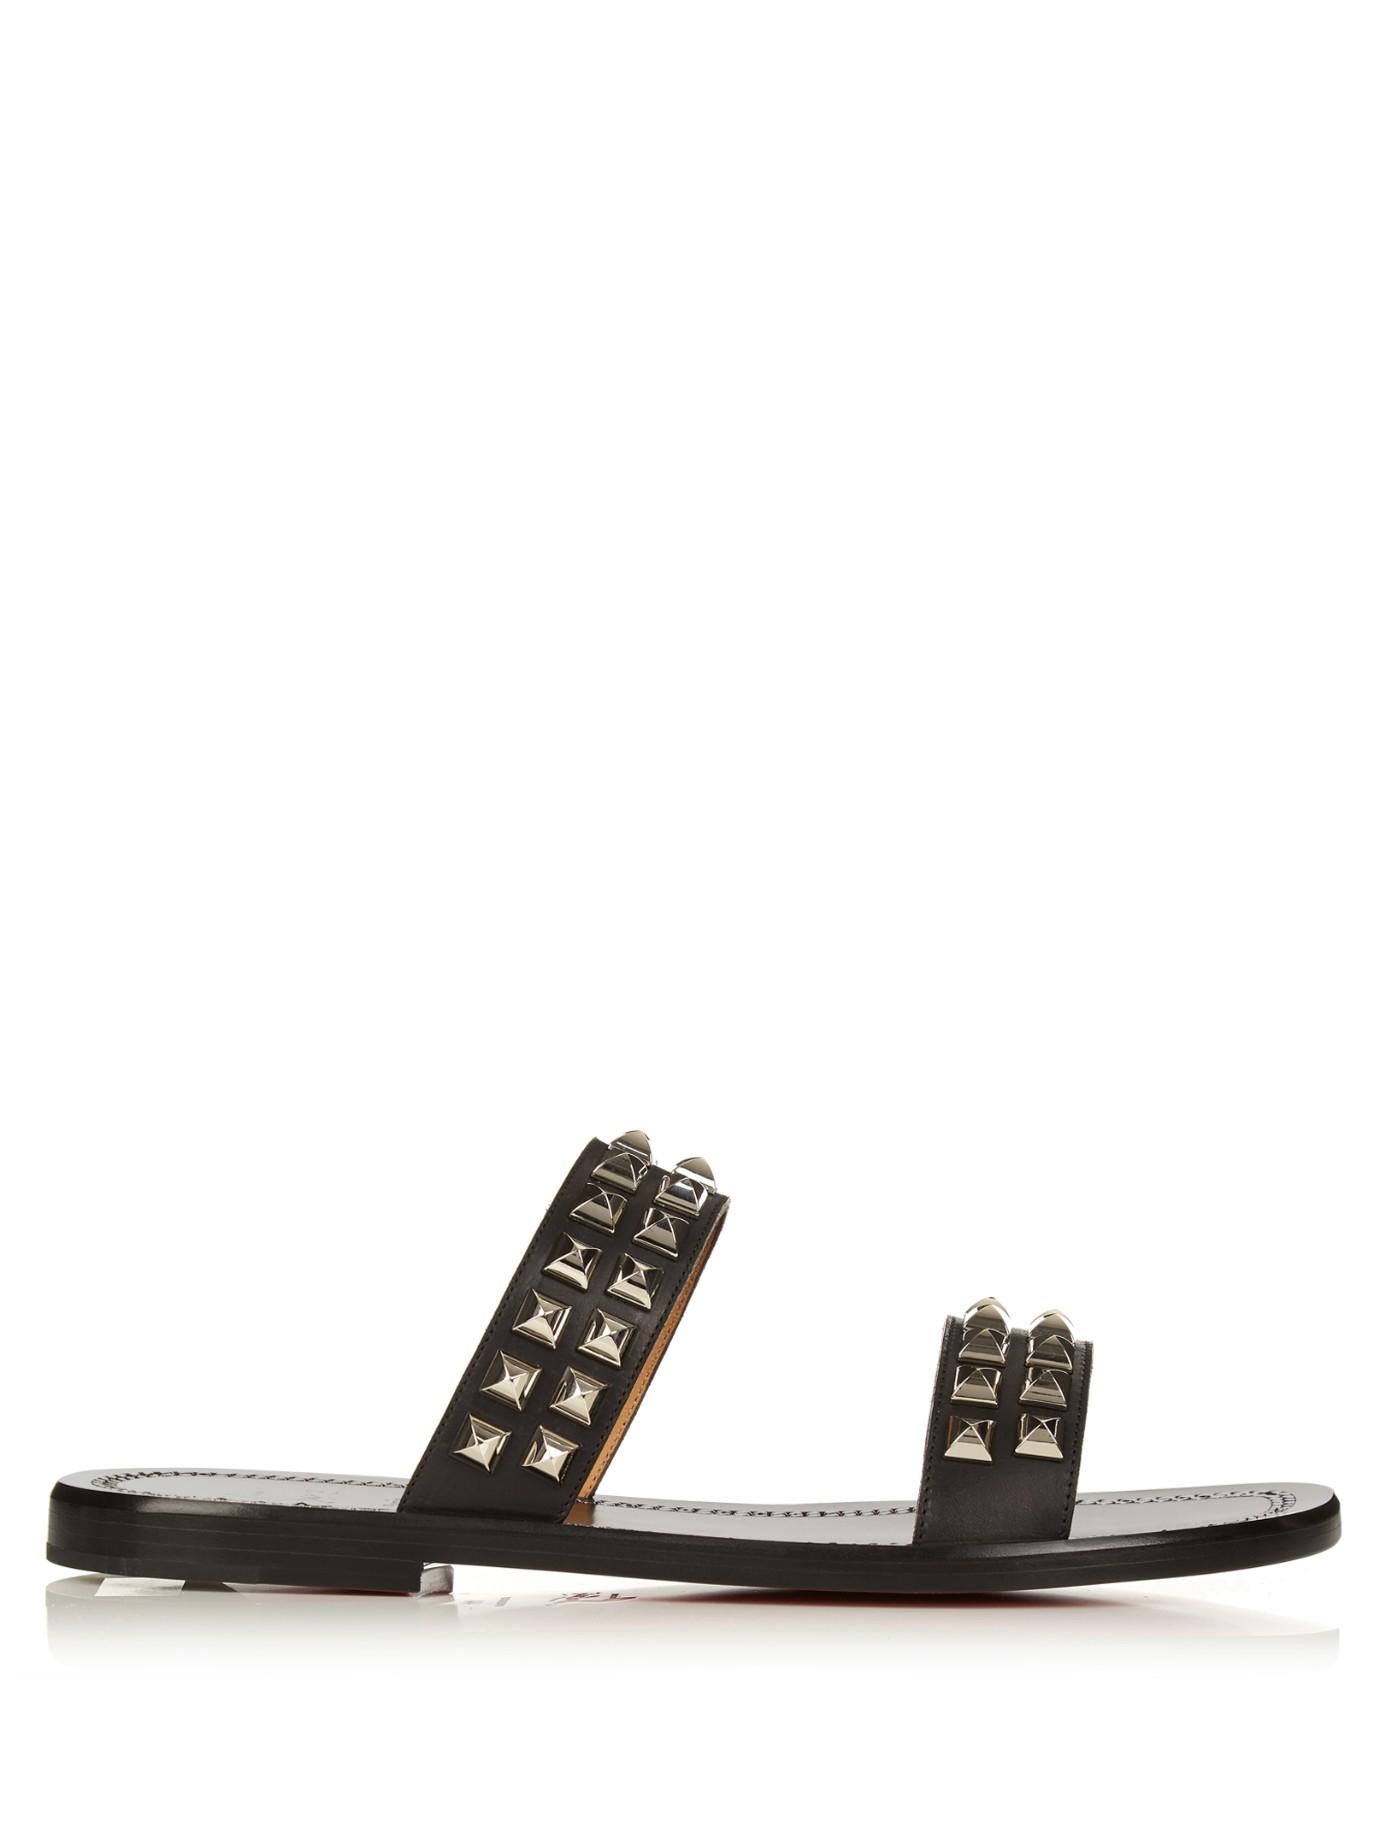 louboutin beach sandals